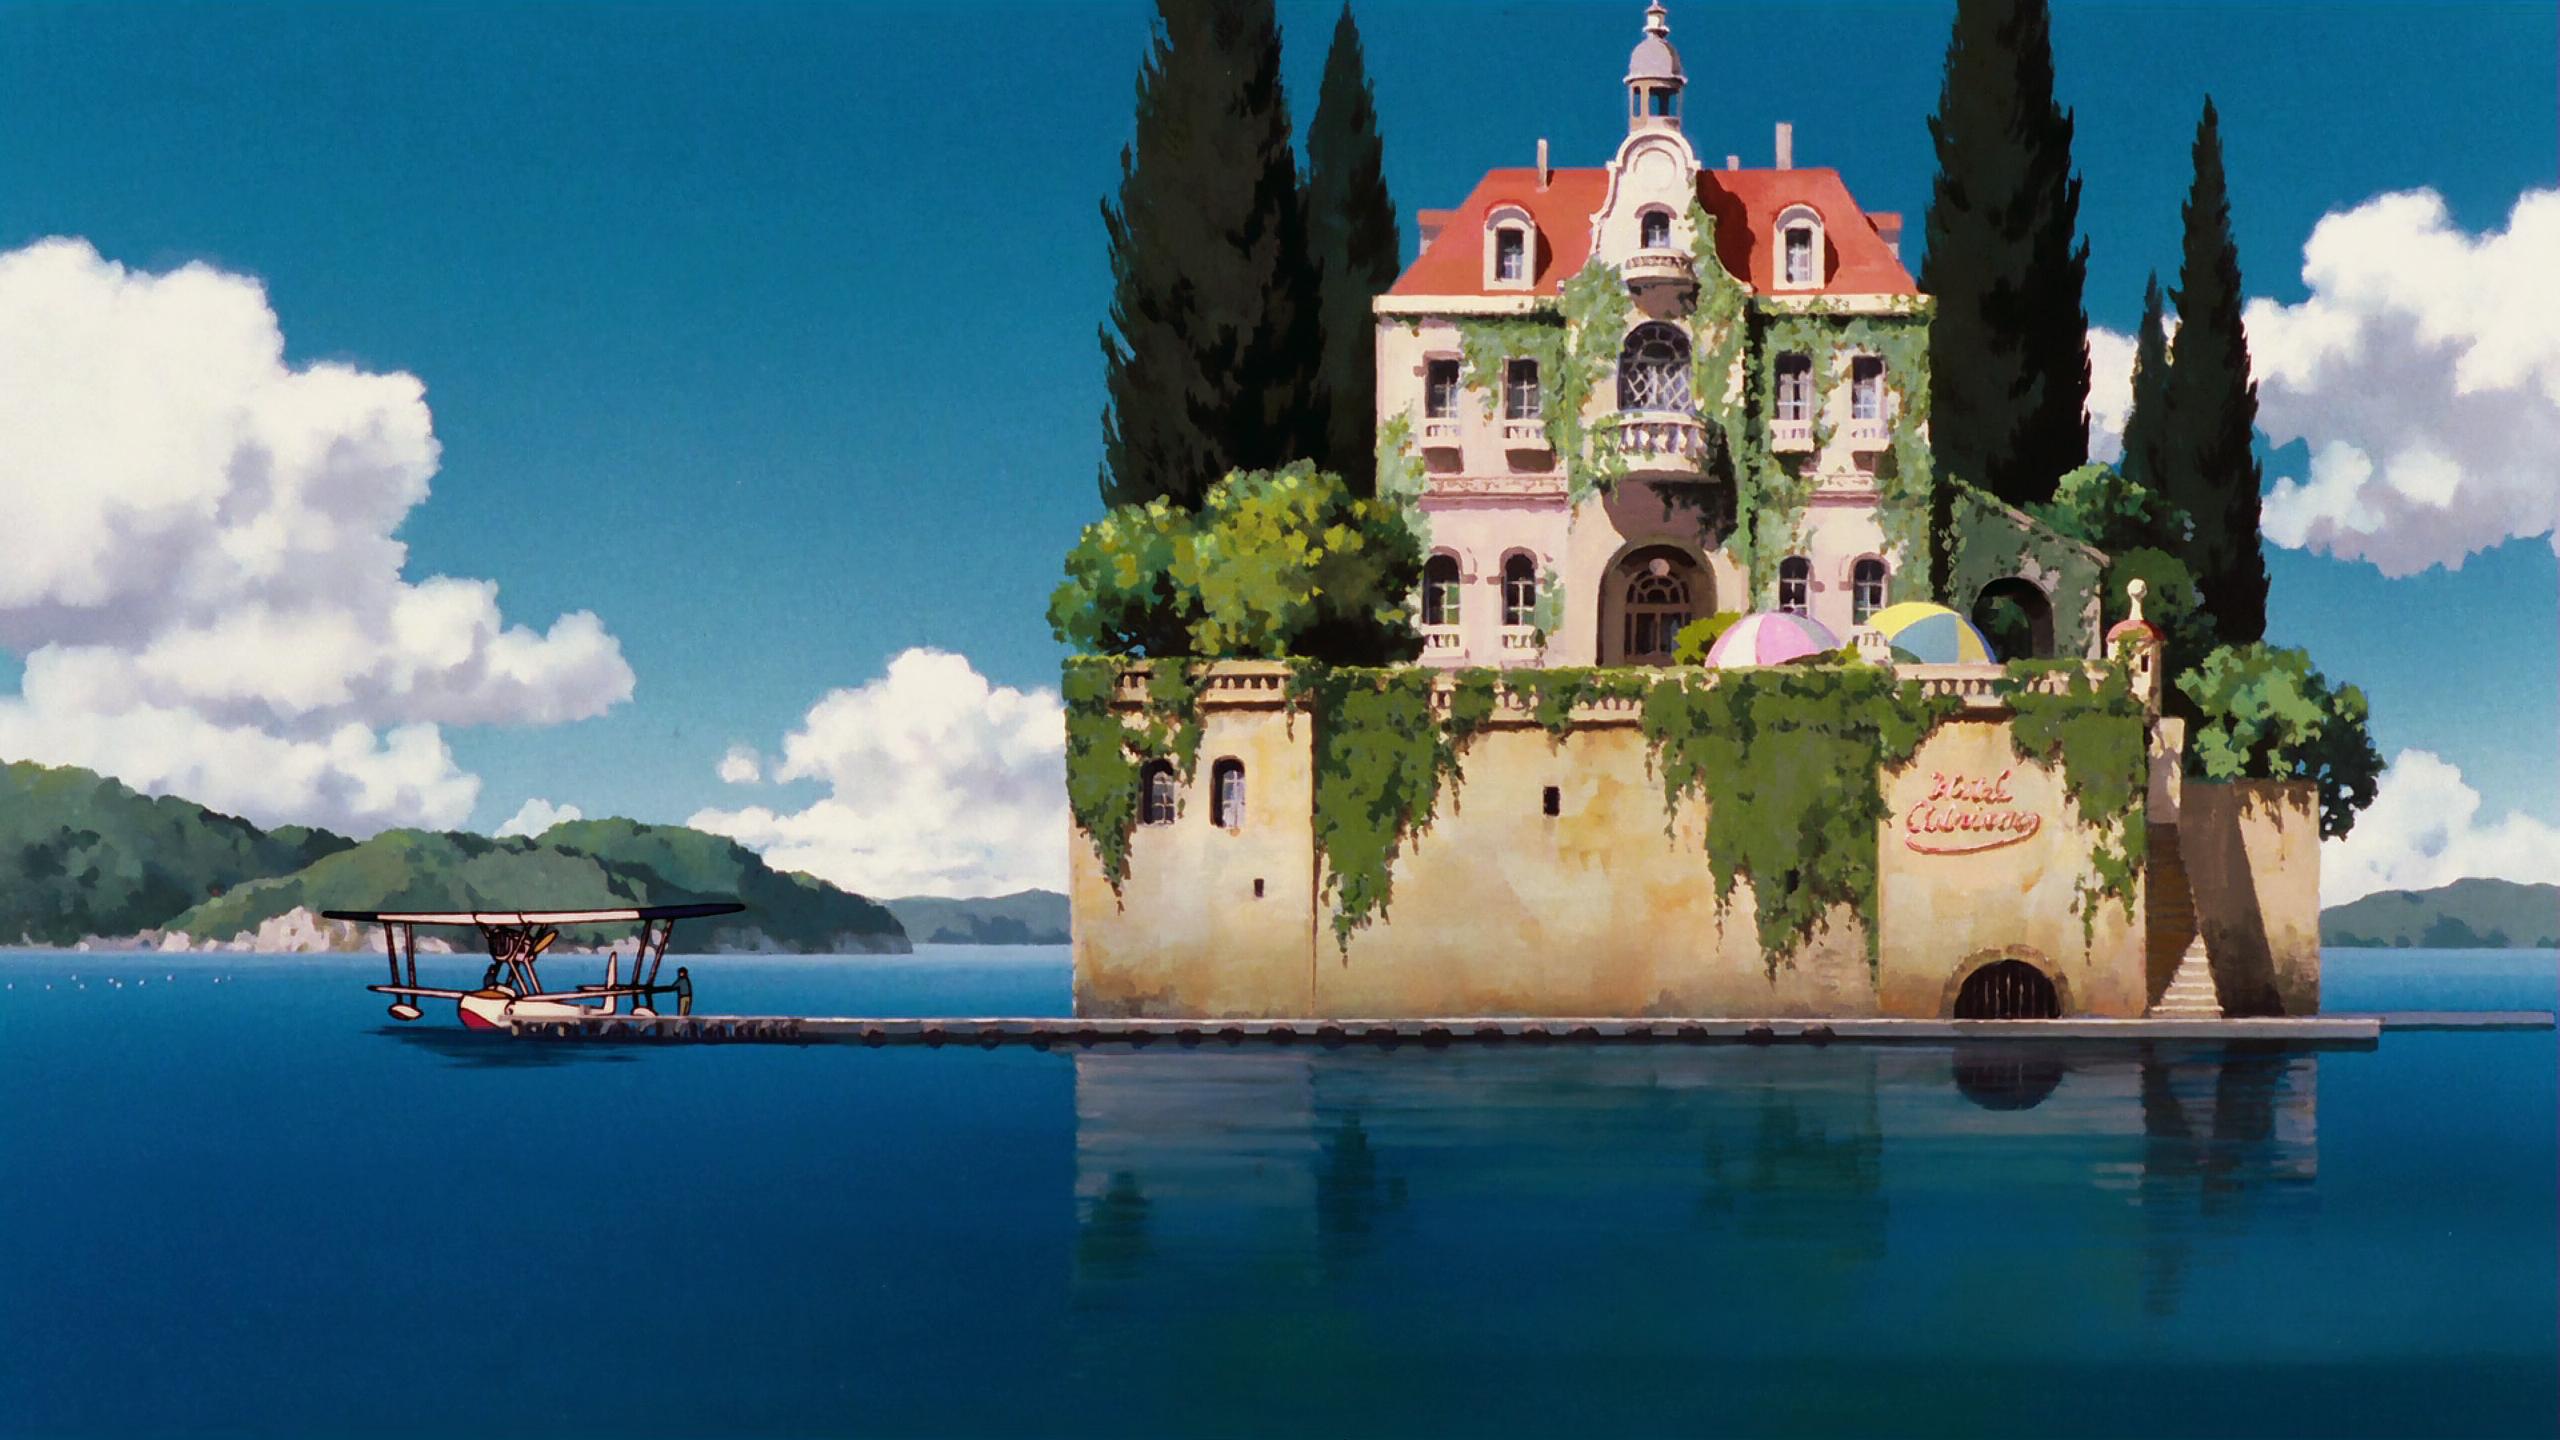 Studio Ghibli Wallpapers Art Of